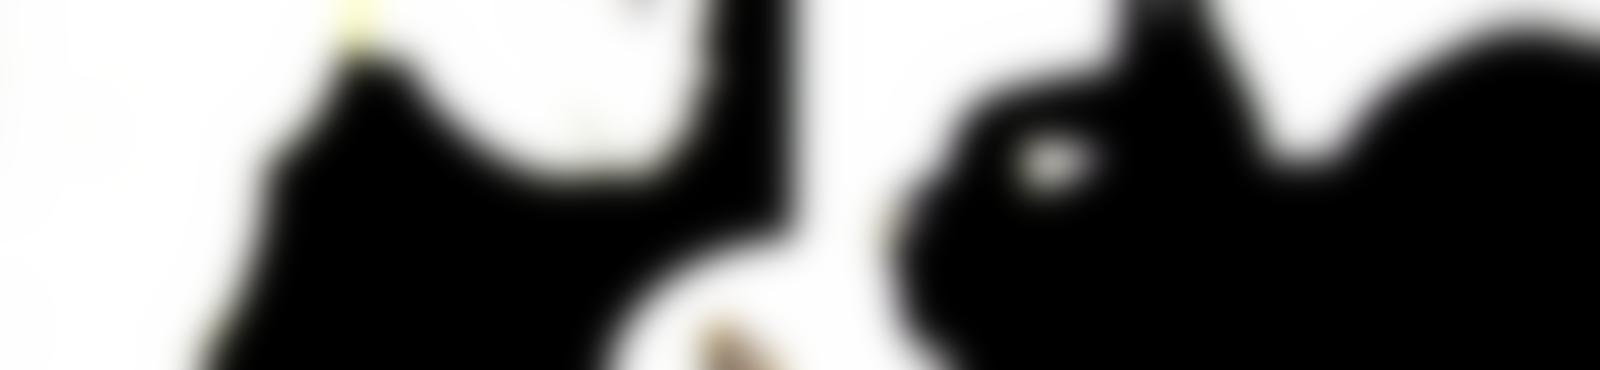 Blurred 83430e2f f3b3 4157 b46d 8cb437fcf302